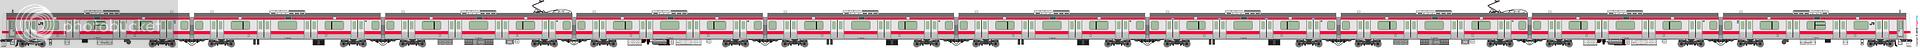 Train 1941